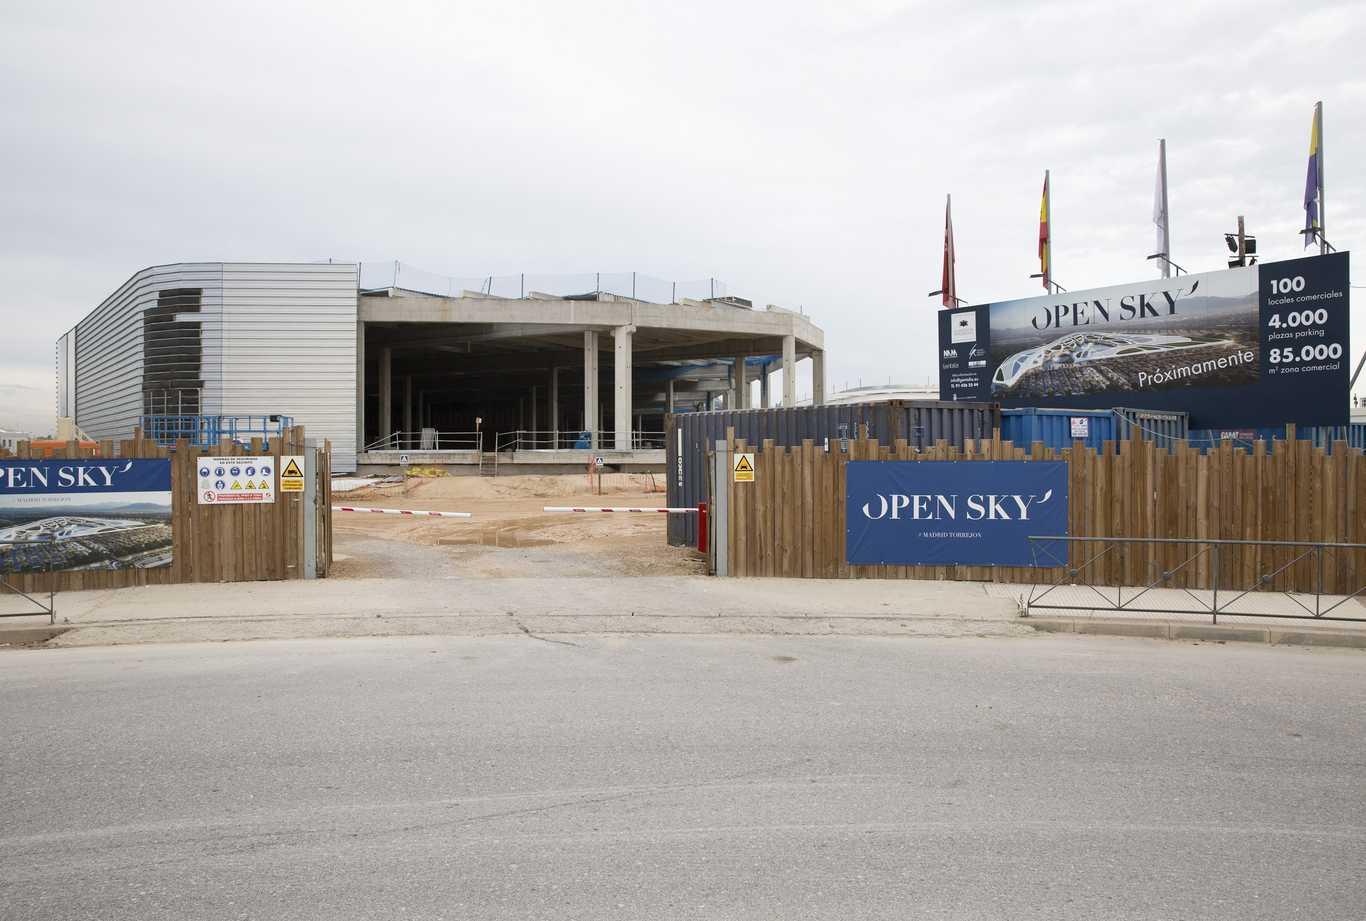 Se Retrasa La Apertura Del Centro Comercial Open Sky Dream Alcalá